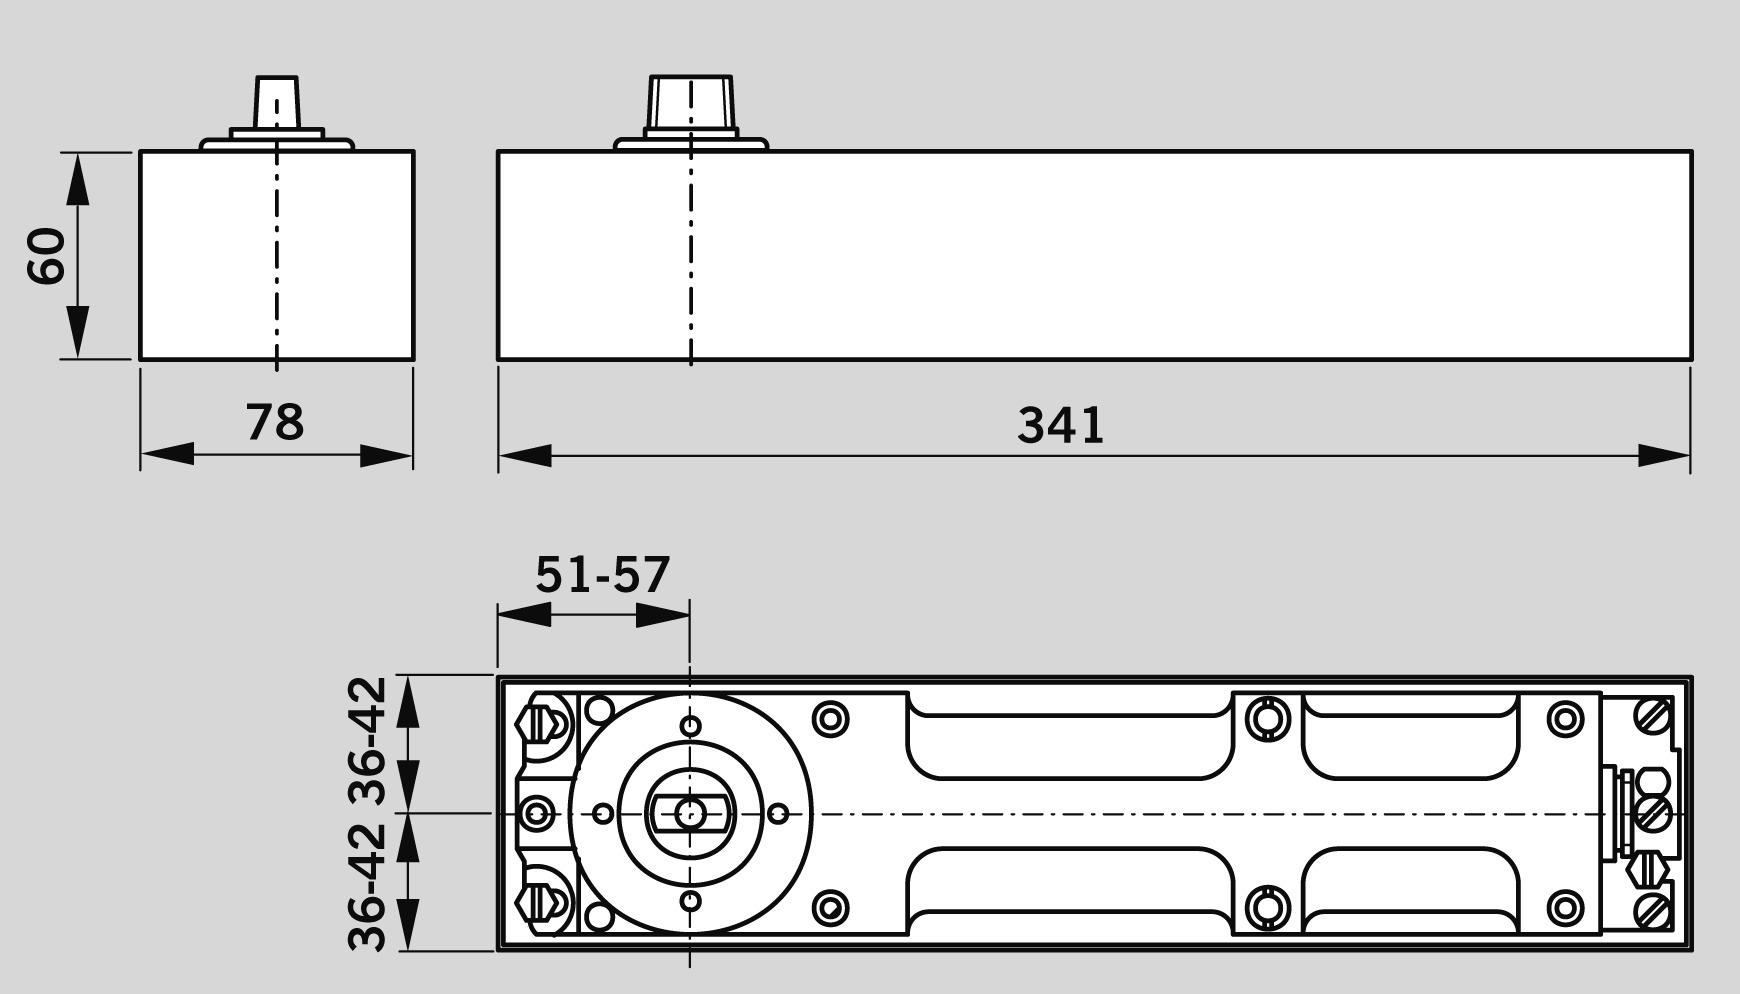 Ferme-porte au sol DORMA BTS 80 F